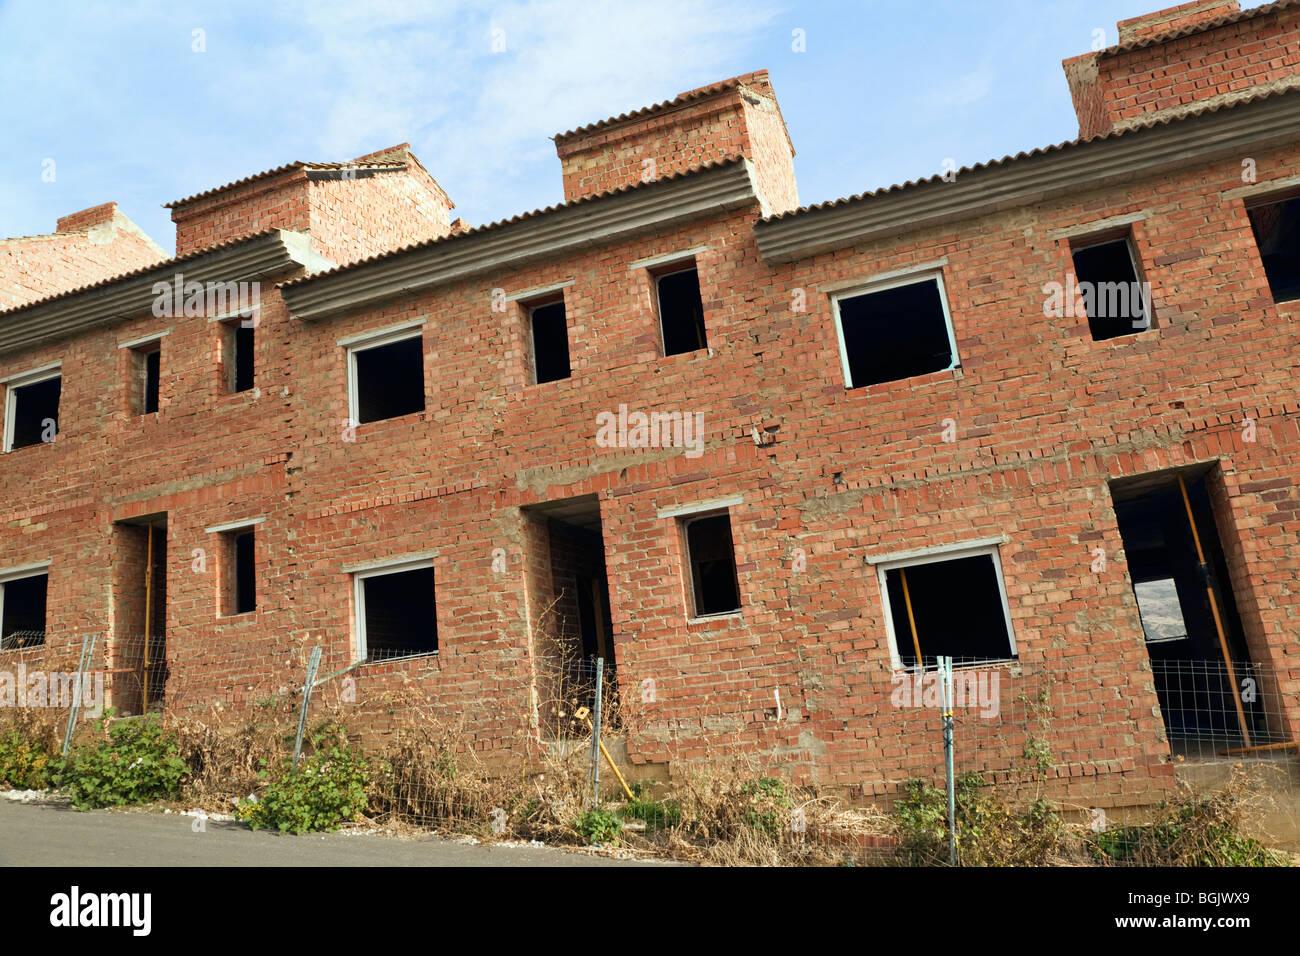 Unfinished property in Villanueva de la Concepcion, Malaga Province, Spain. - Stock Image